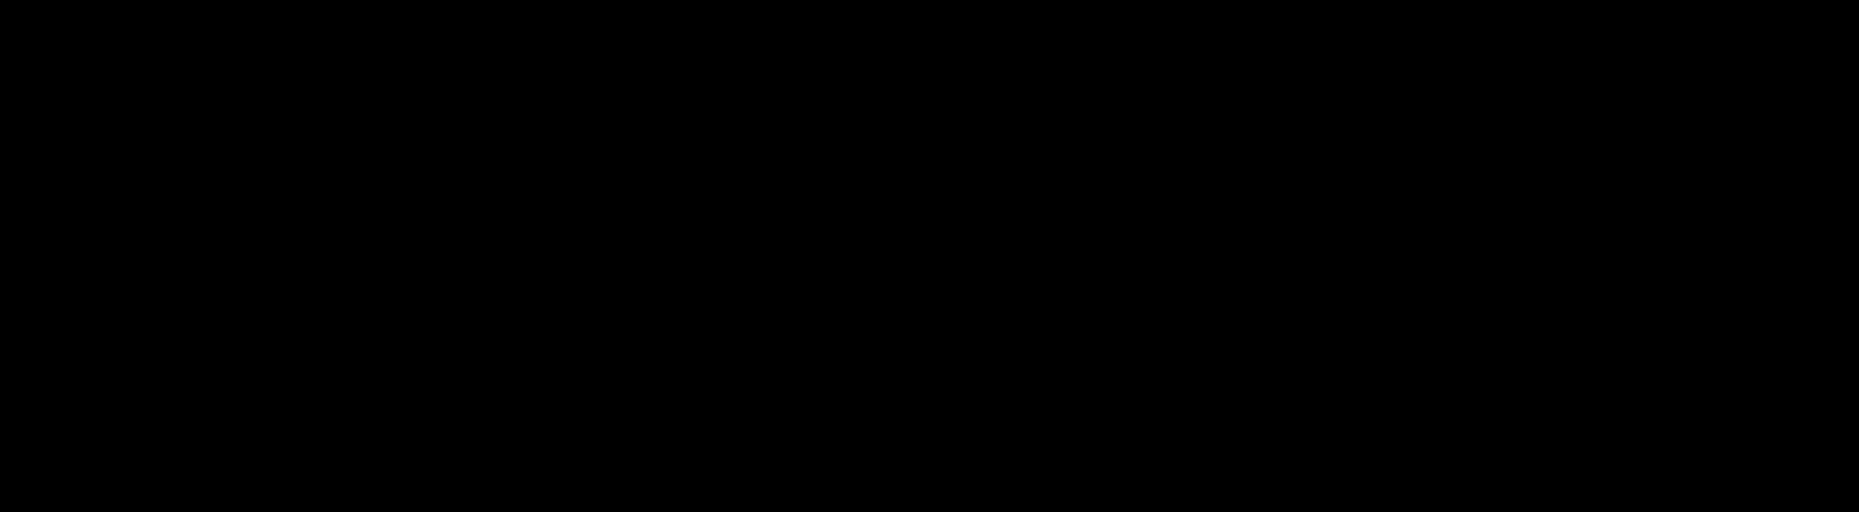 joaillerie welter